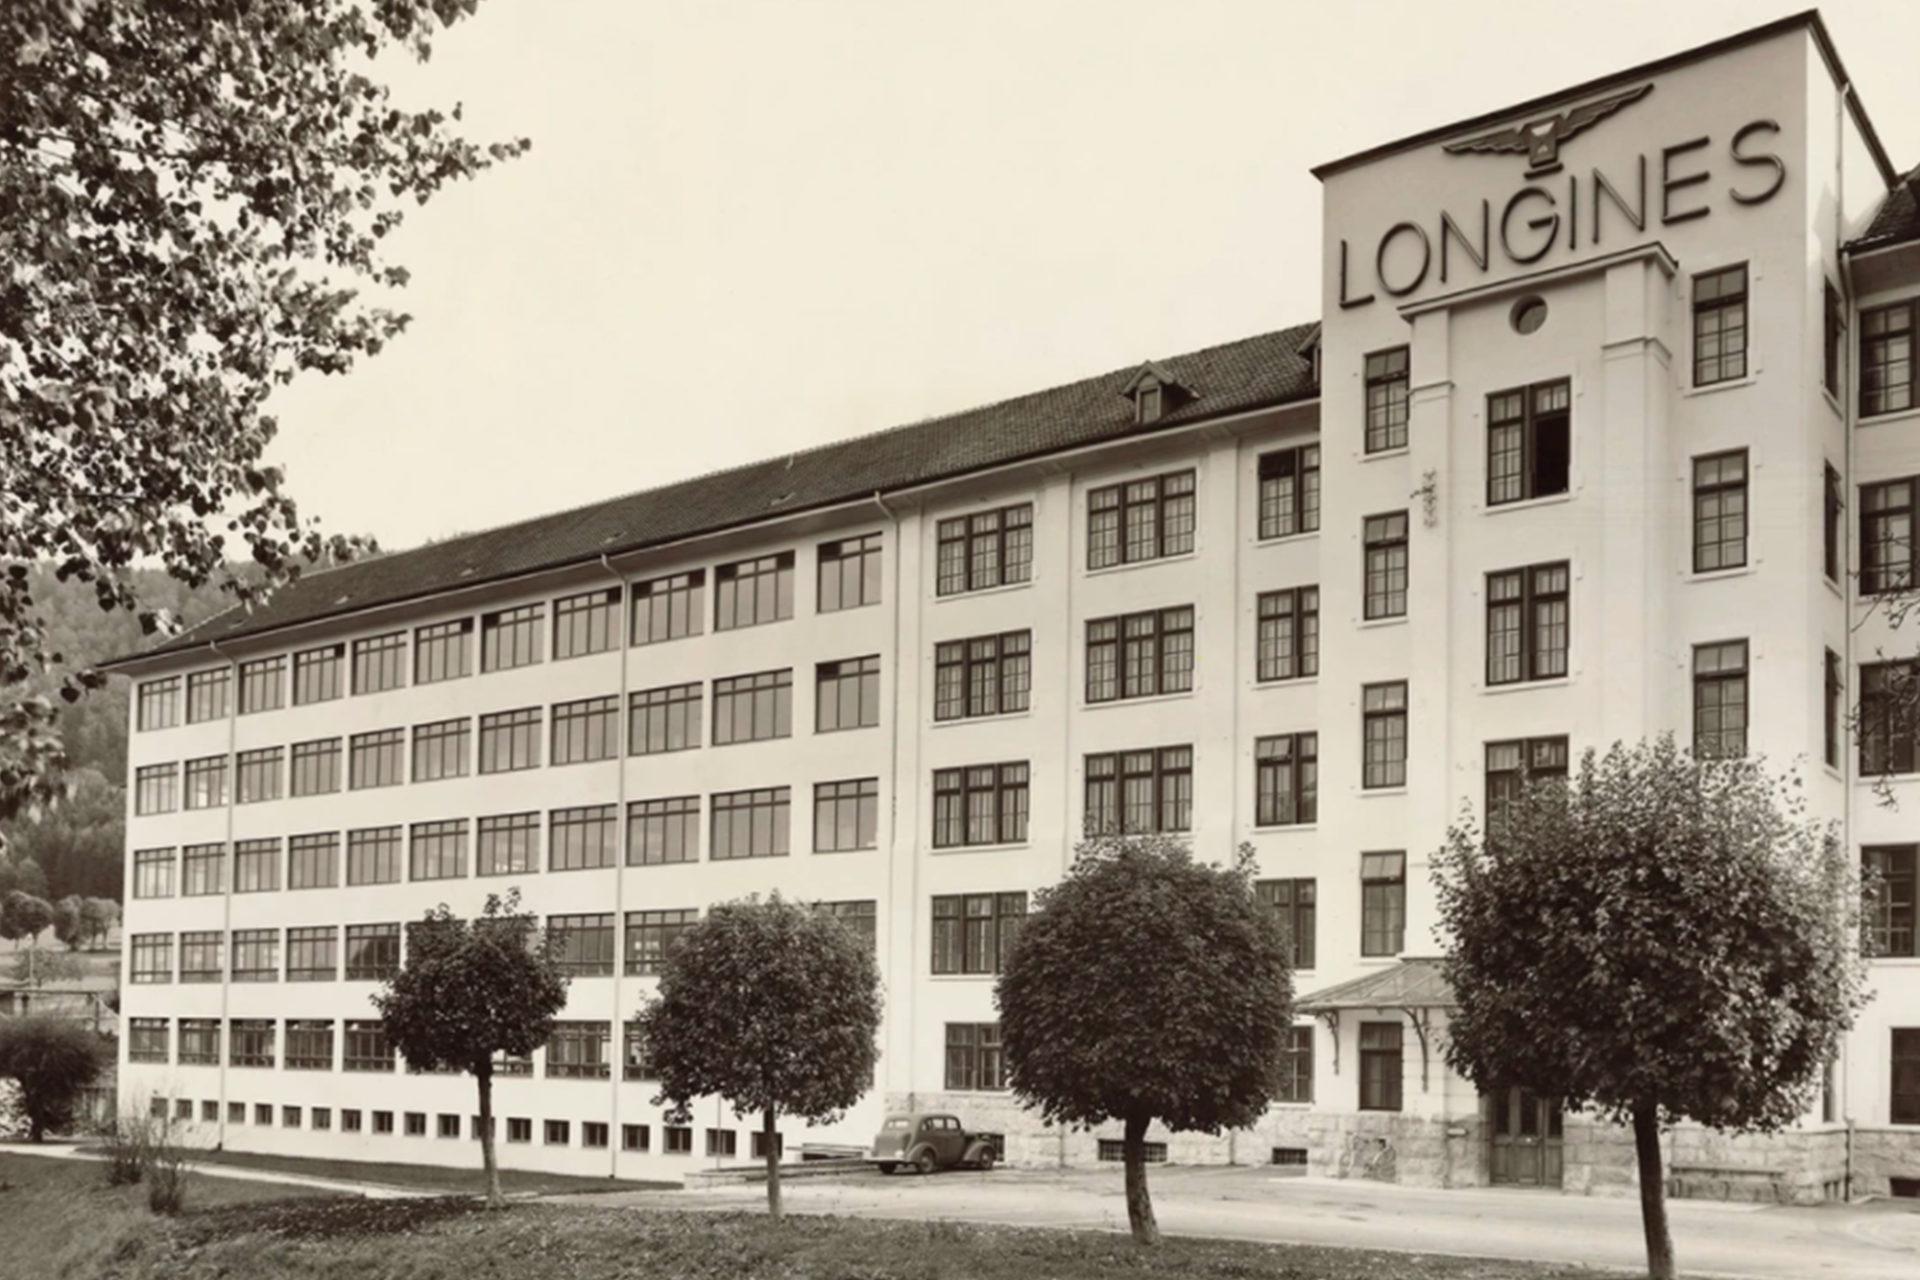 longines-saint-imier-1920×1280-1